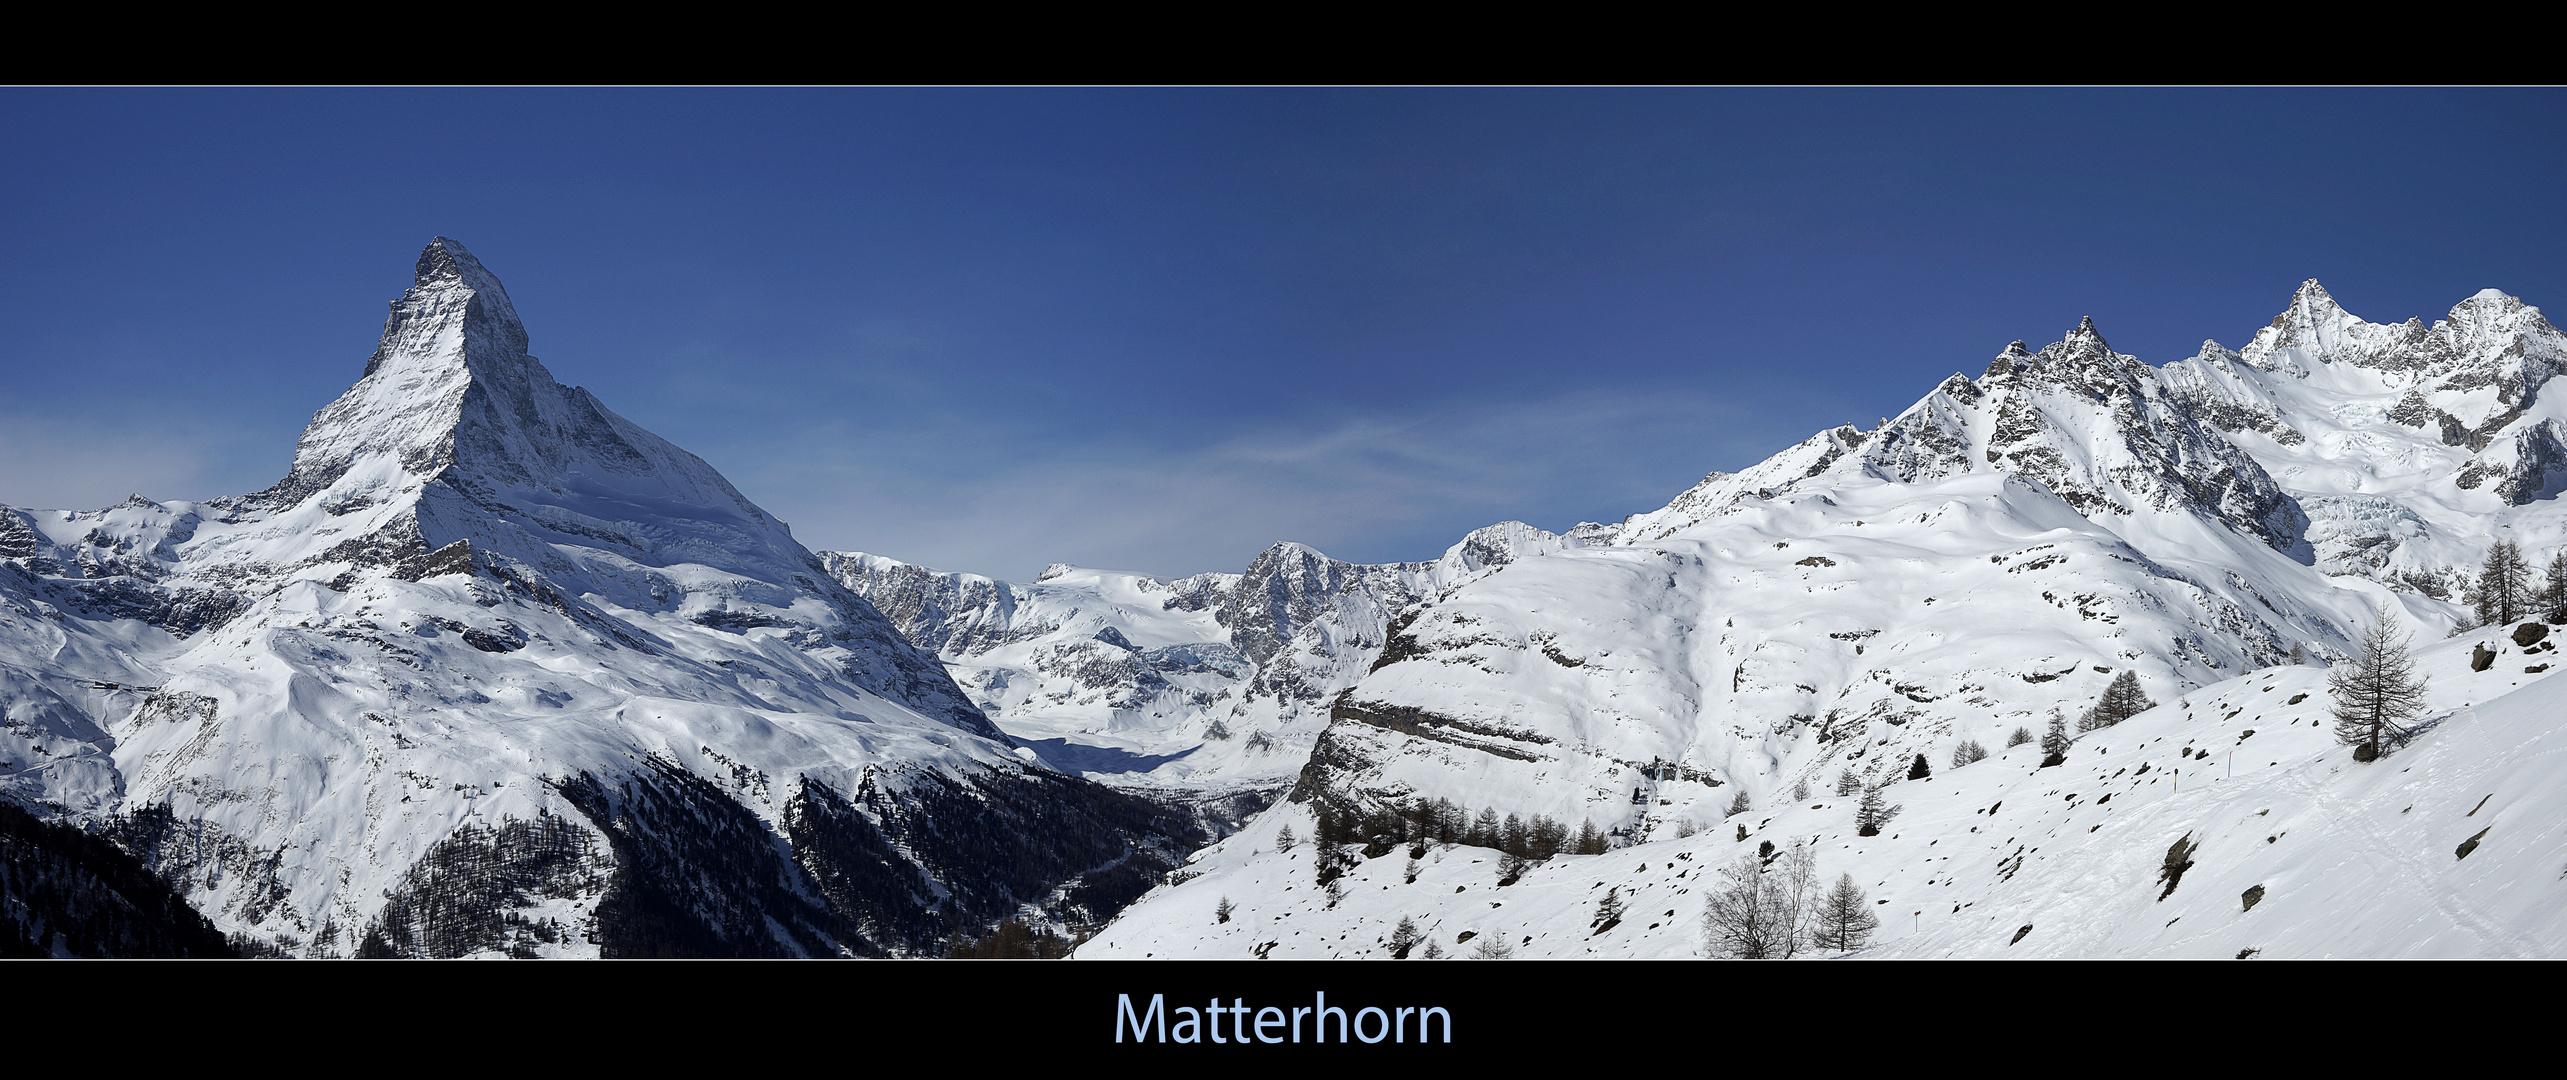 Matterhorn - Panorama 1